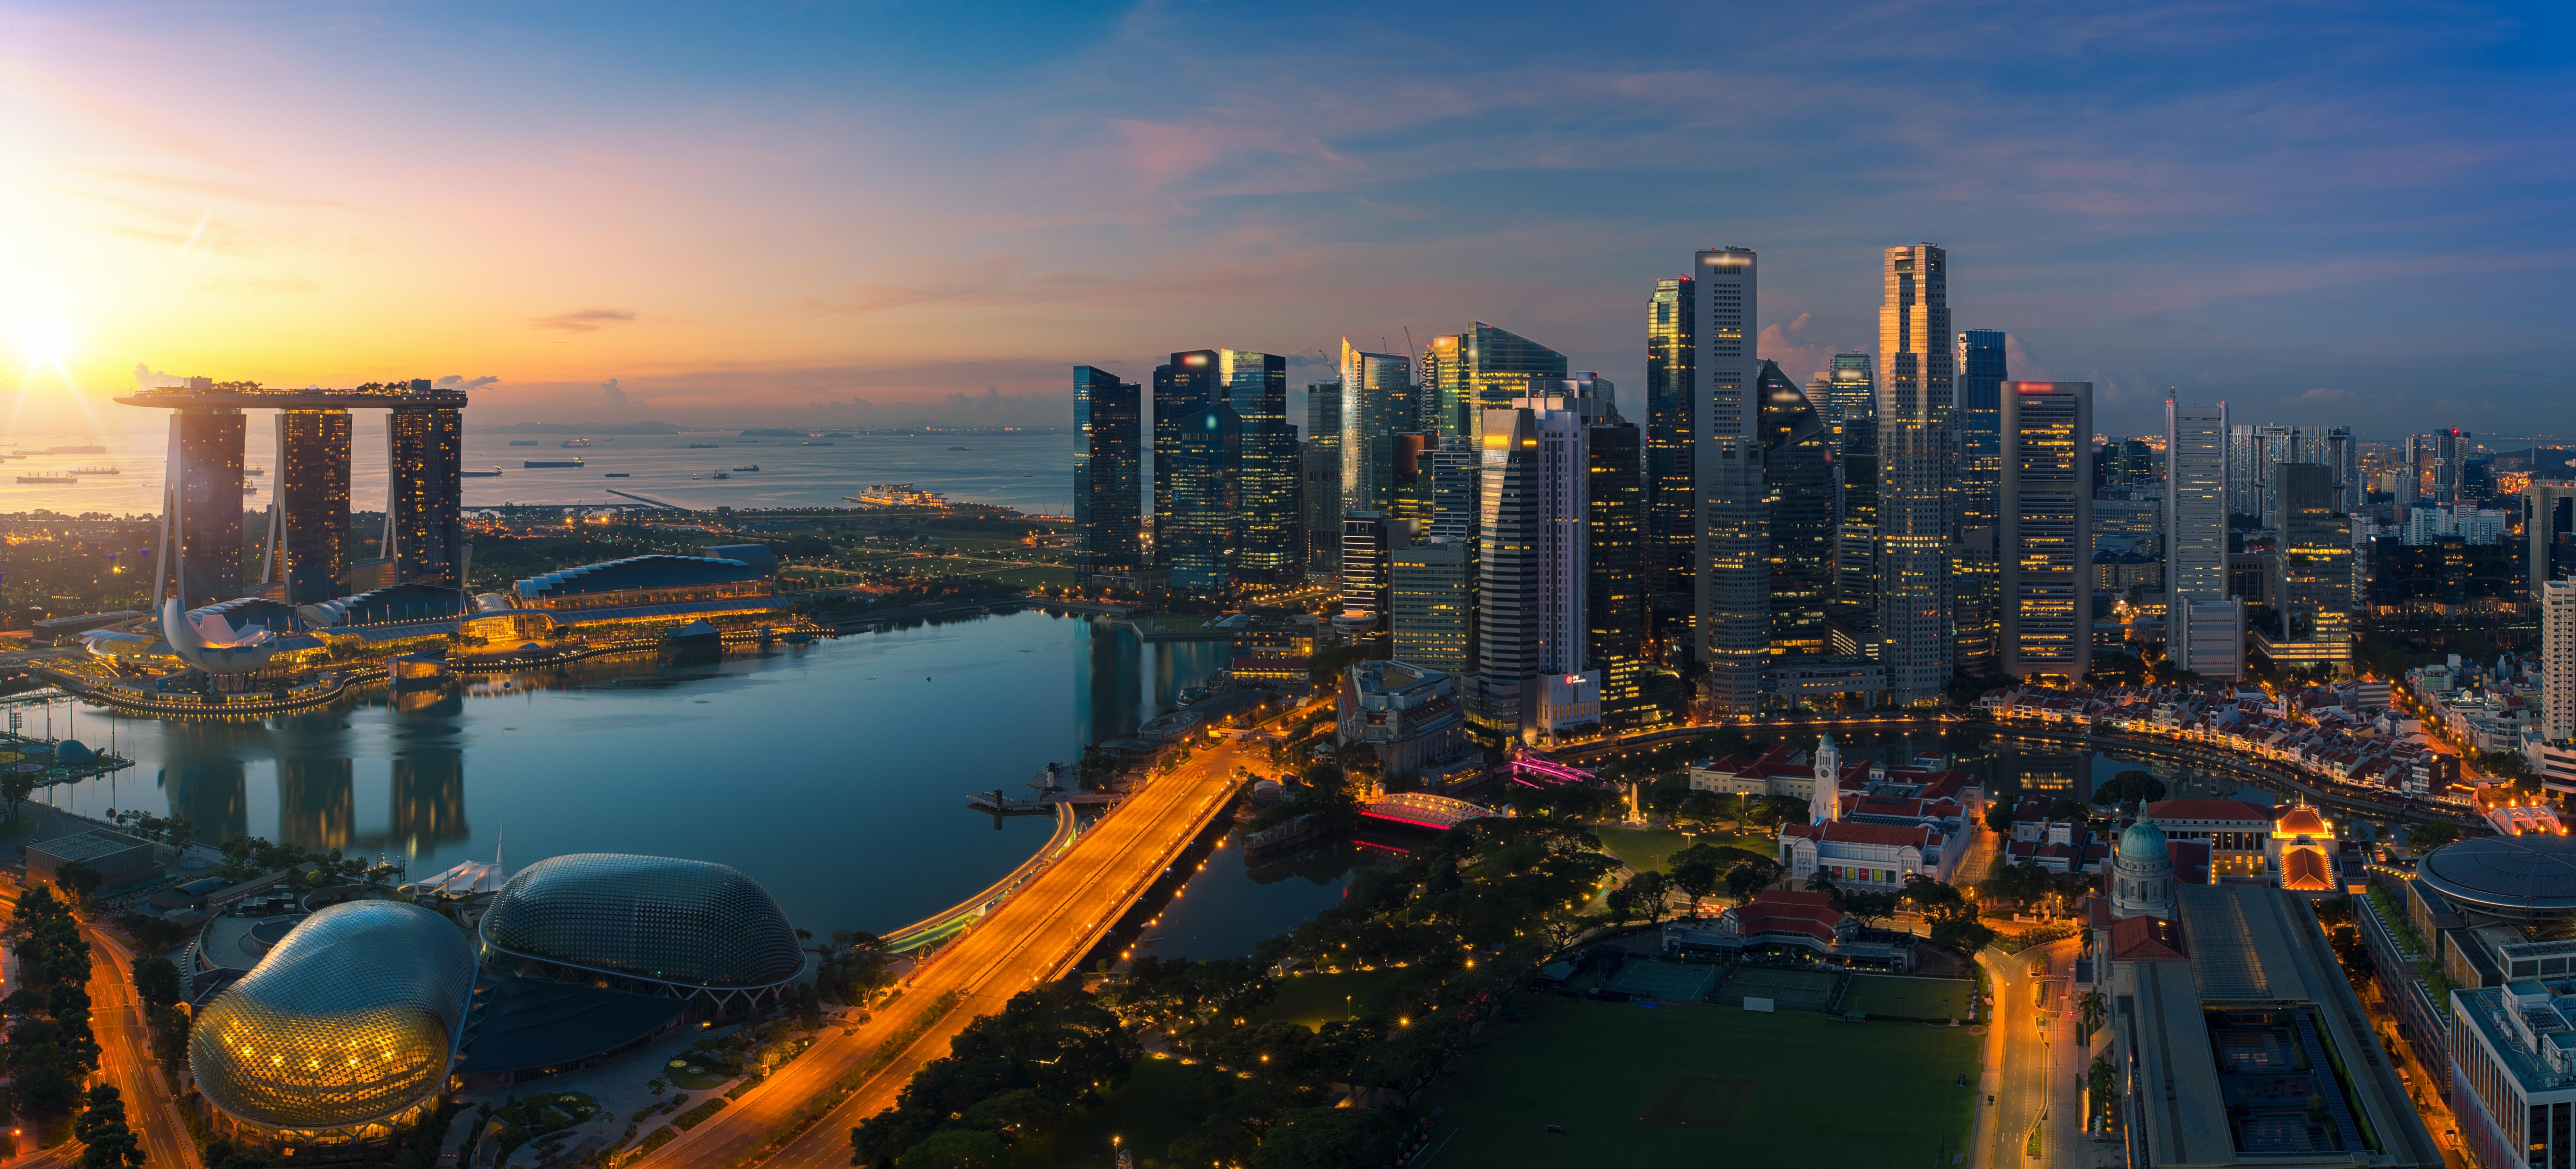 Singapore Joins the Hague Apostille Convention